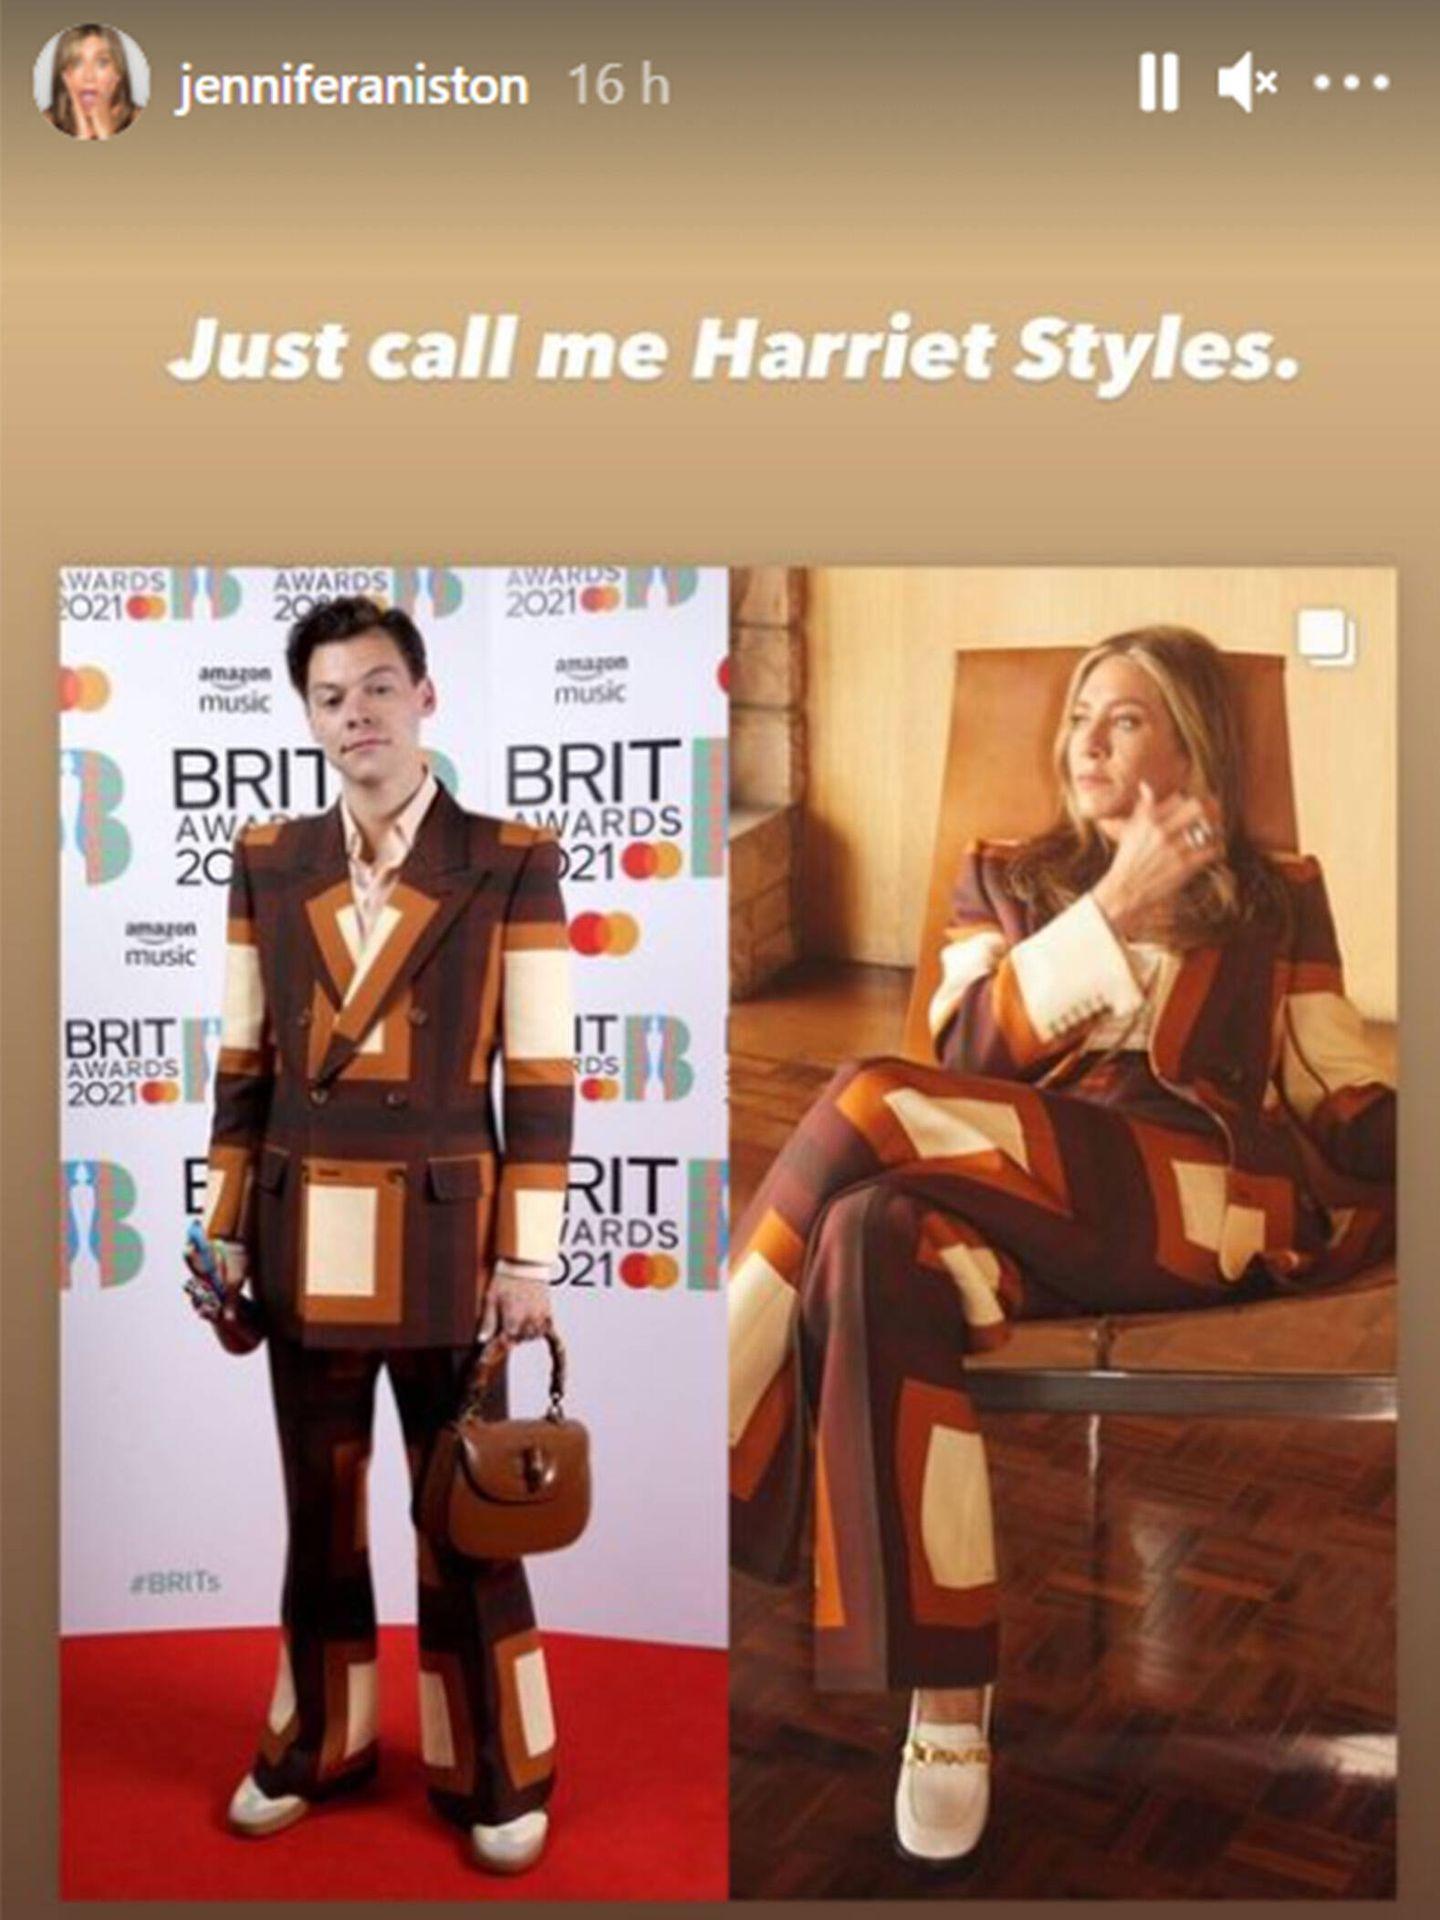 Harry Styles y Jennifer Aniston con el mismo traje de chaqueta. (Instagram @jenniferaniston)